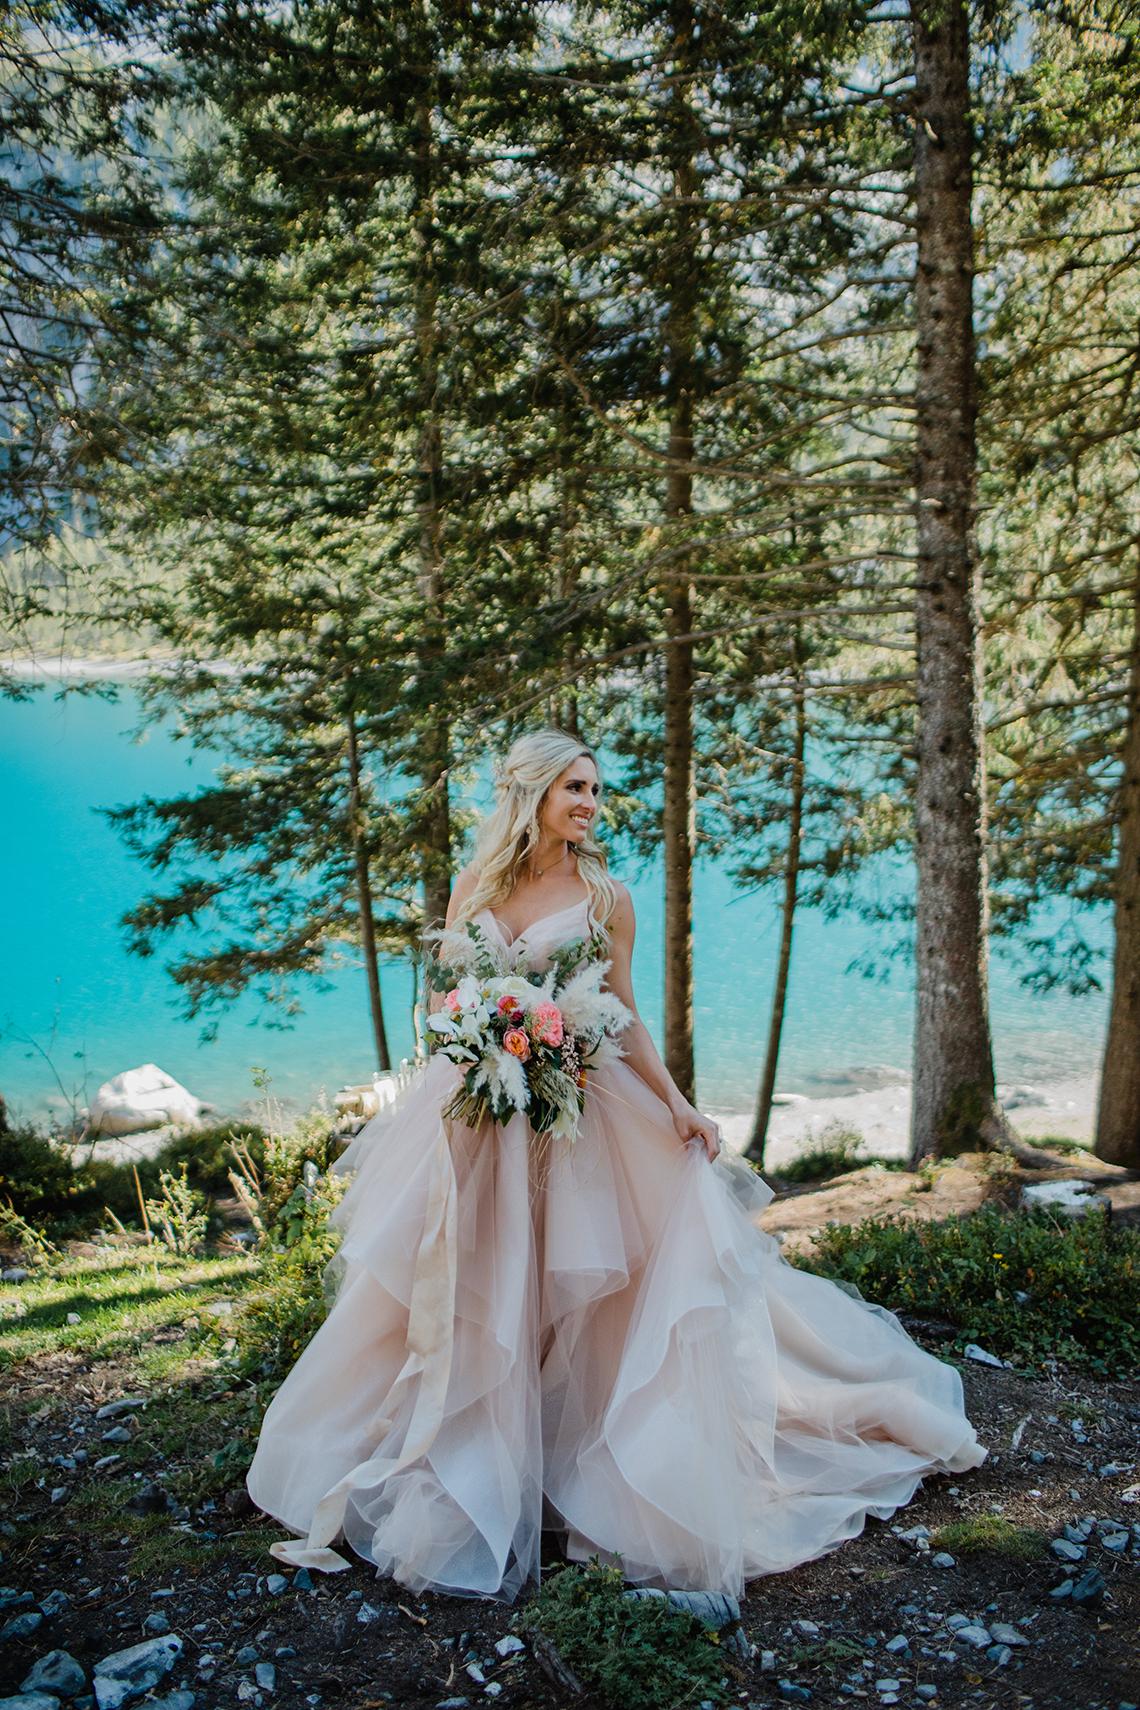 Amazing Adventurous Swiss Alps Mountain Wedding – Unveiled Radiance Photography 57